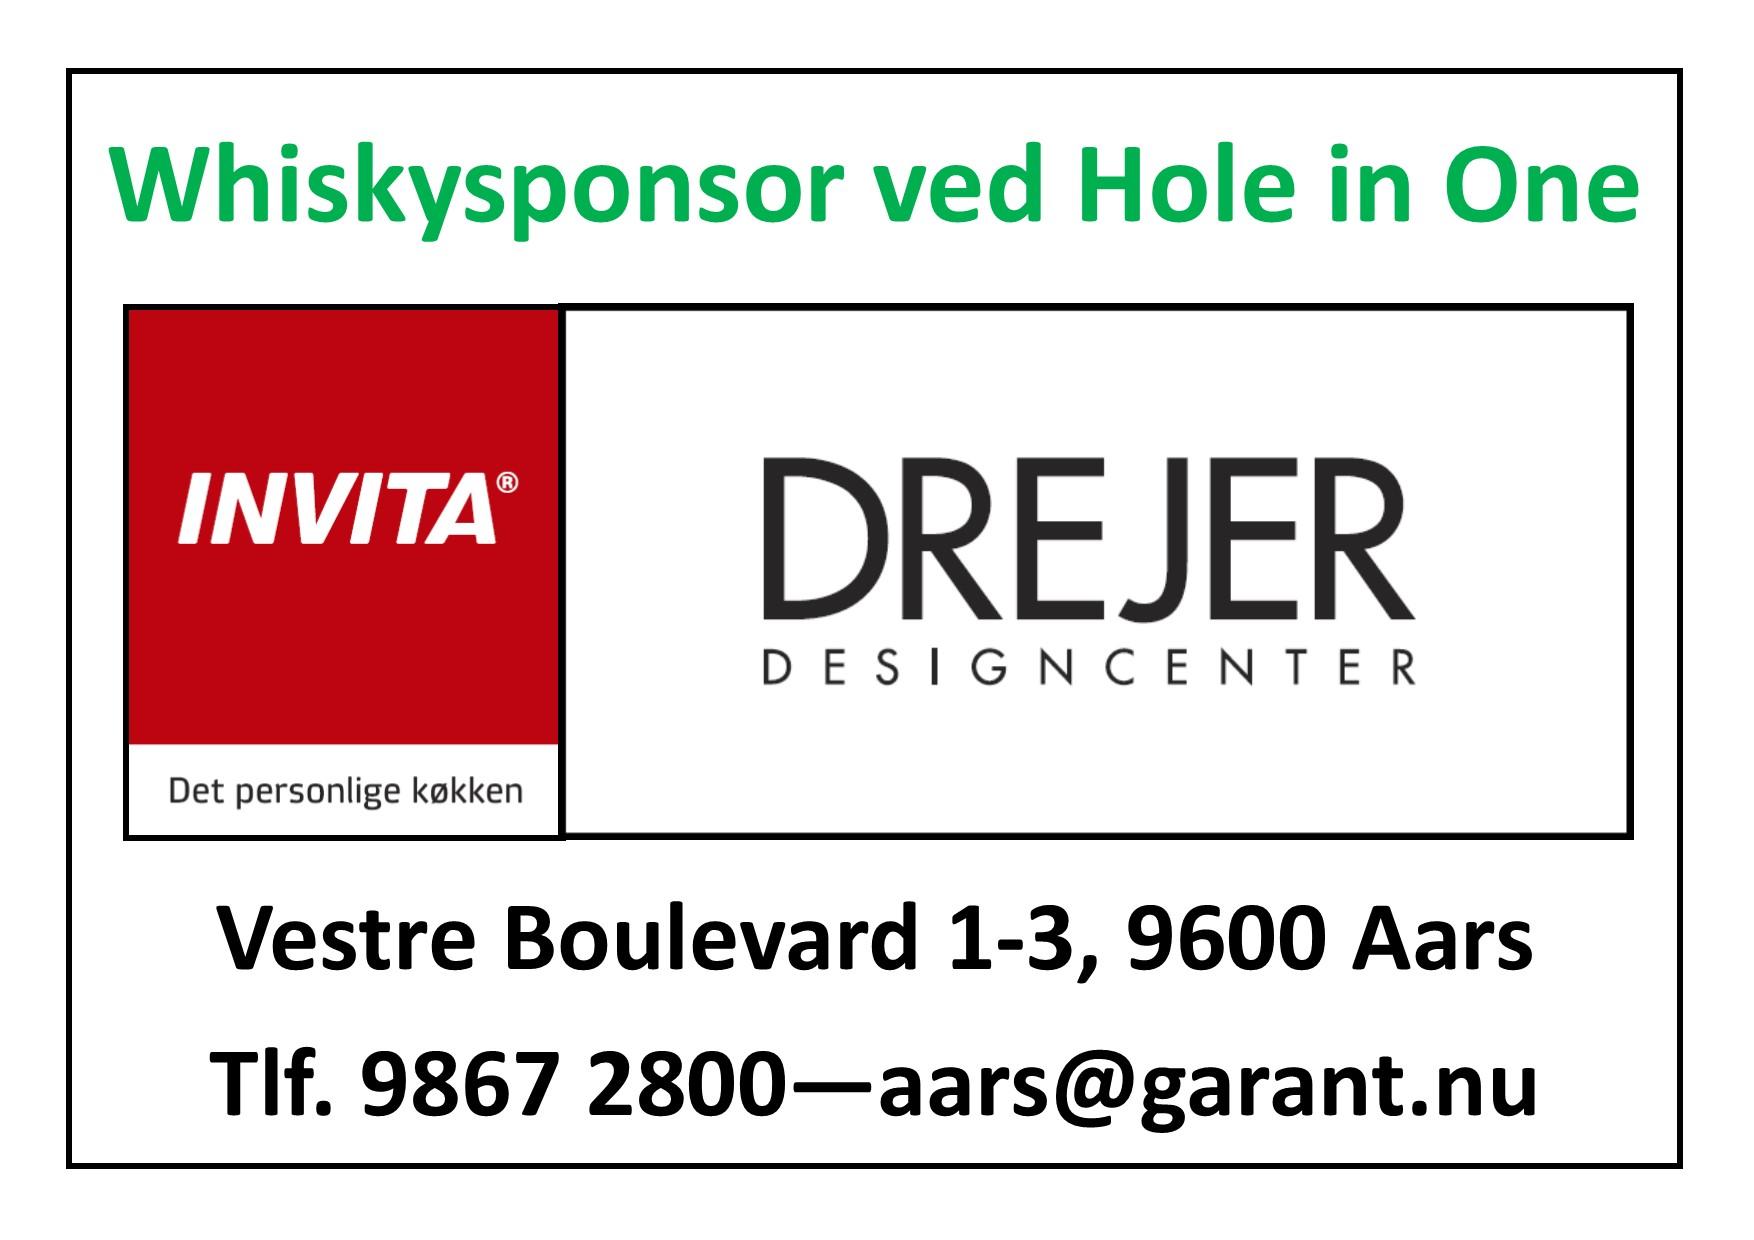 Invita Drejer Designcenter